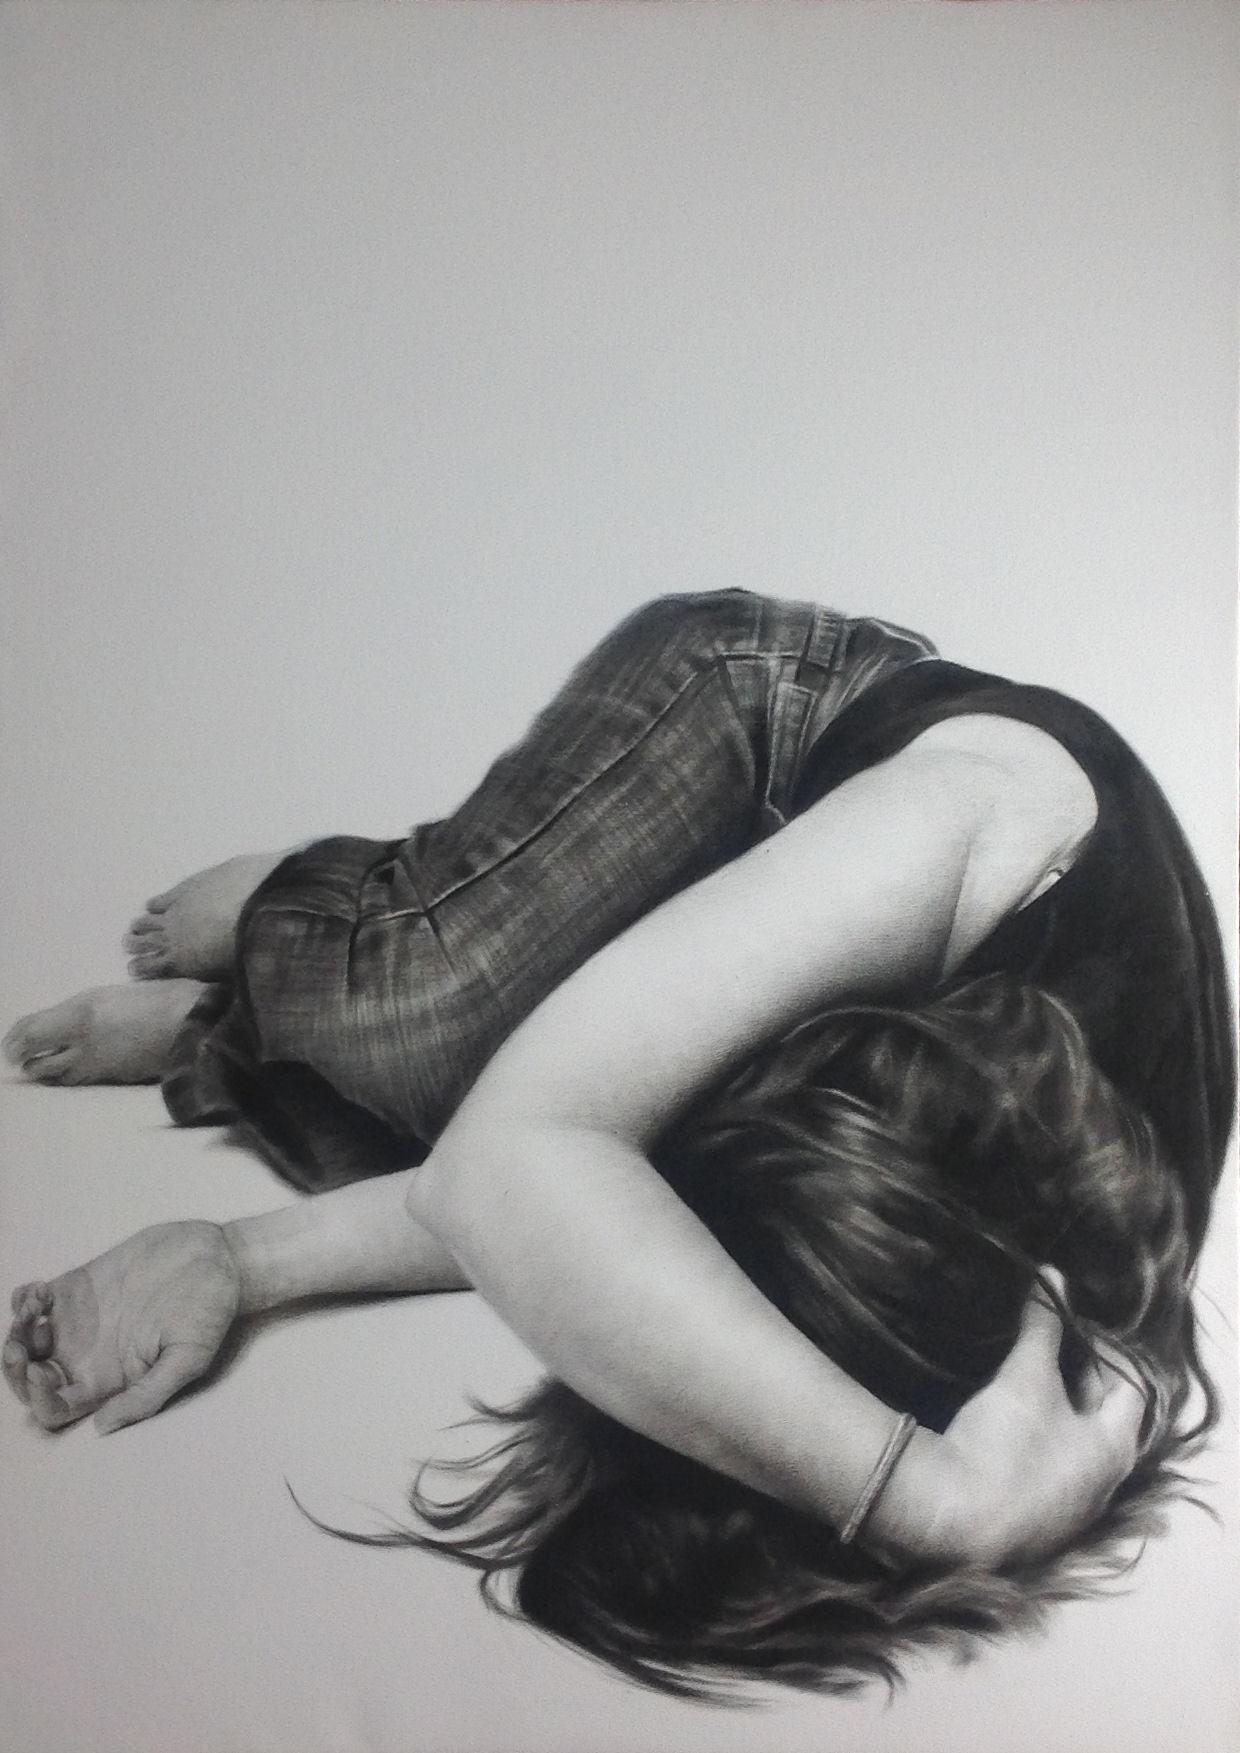 'Curl' by artist Donald Macdonald